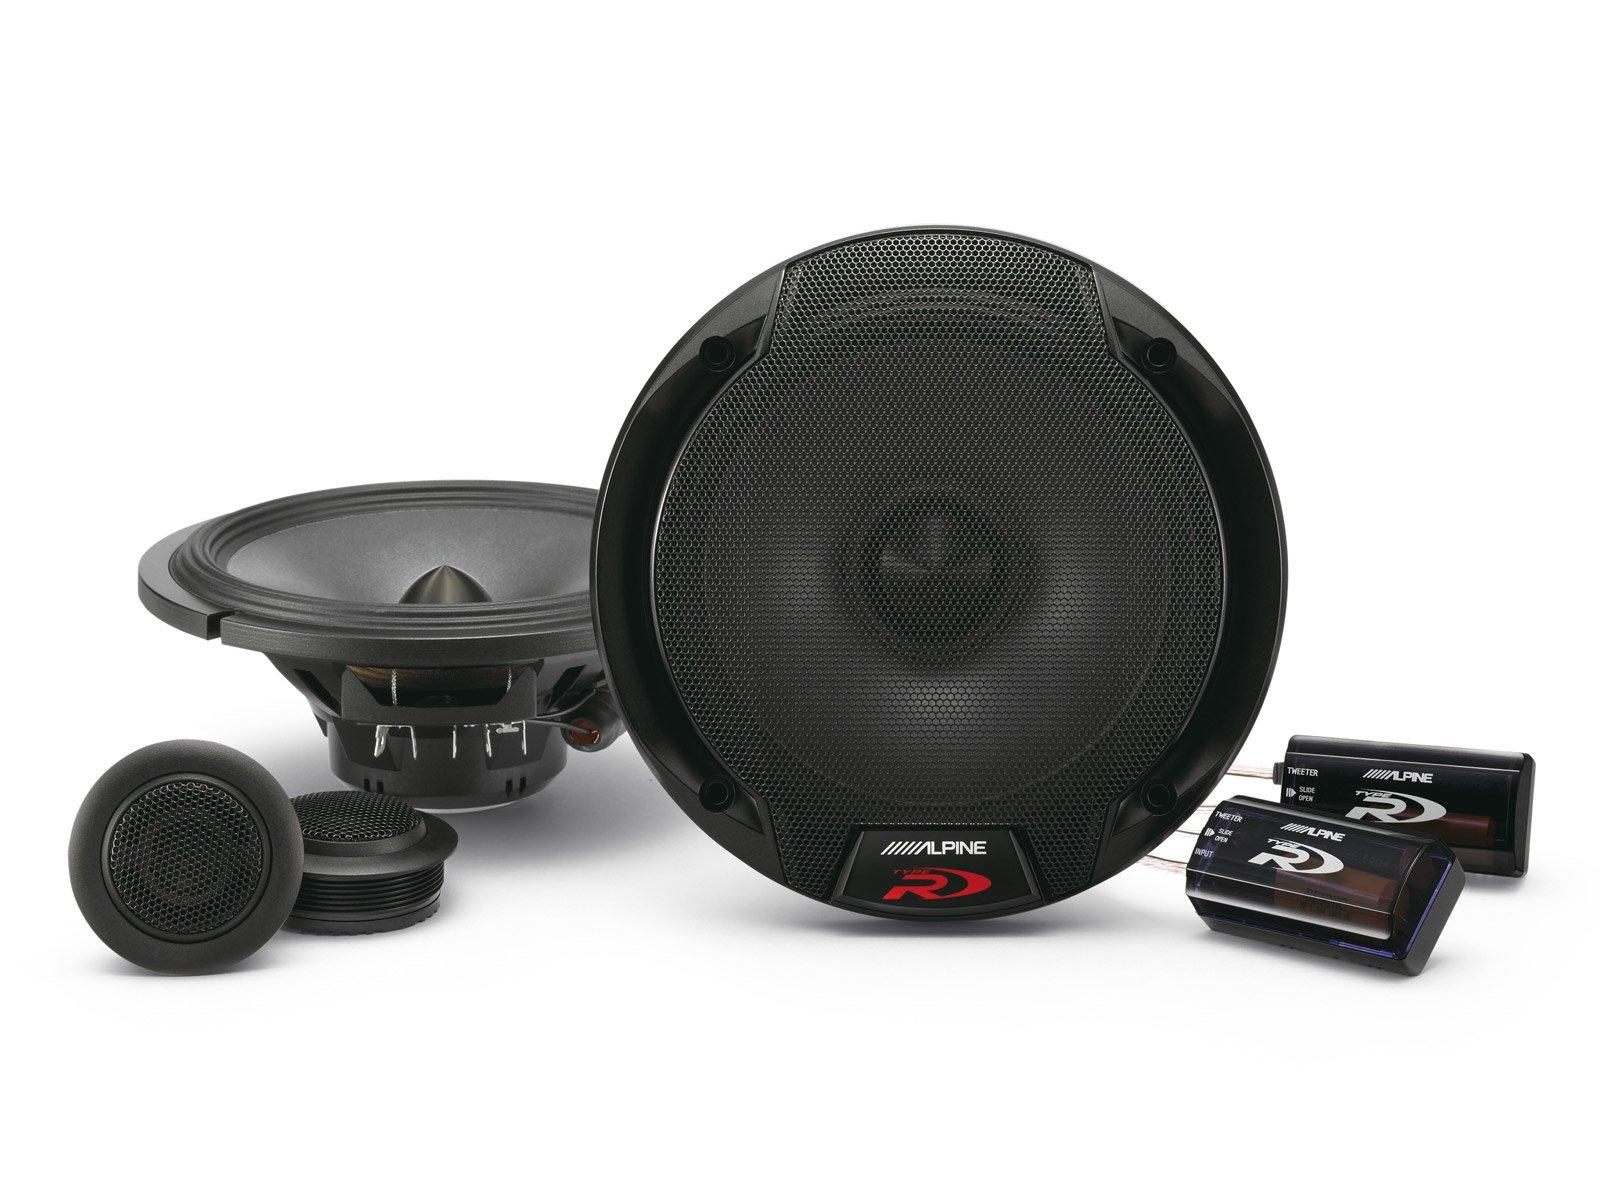 Alpine Spr-60c 6.5-Inch 2 Way Pair of Component Car Speaker System